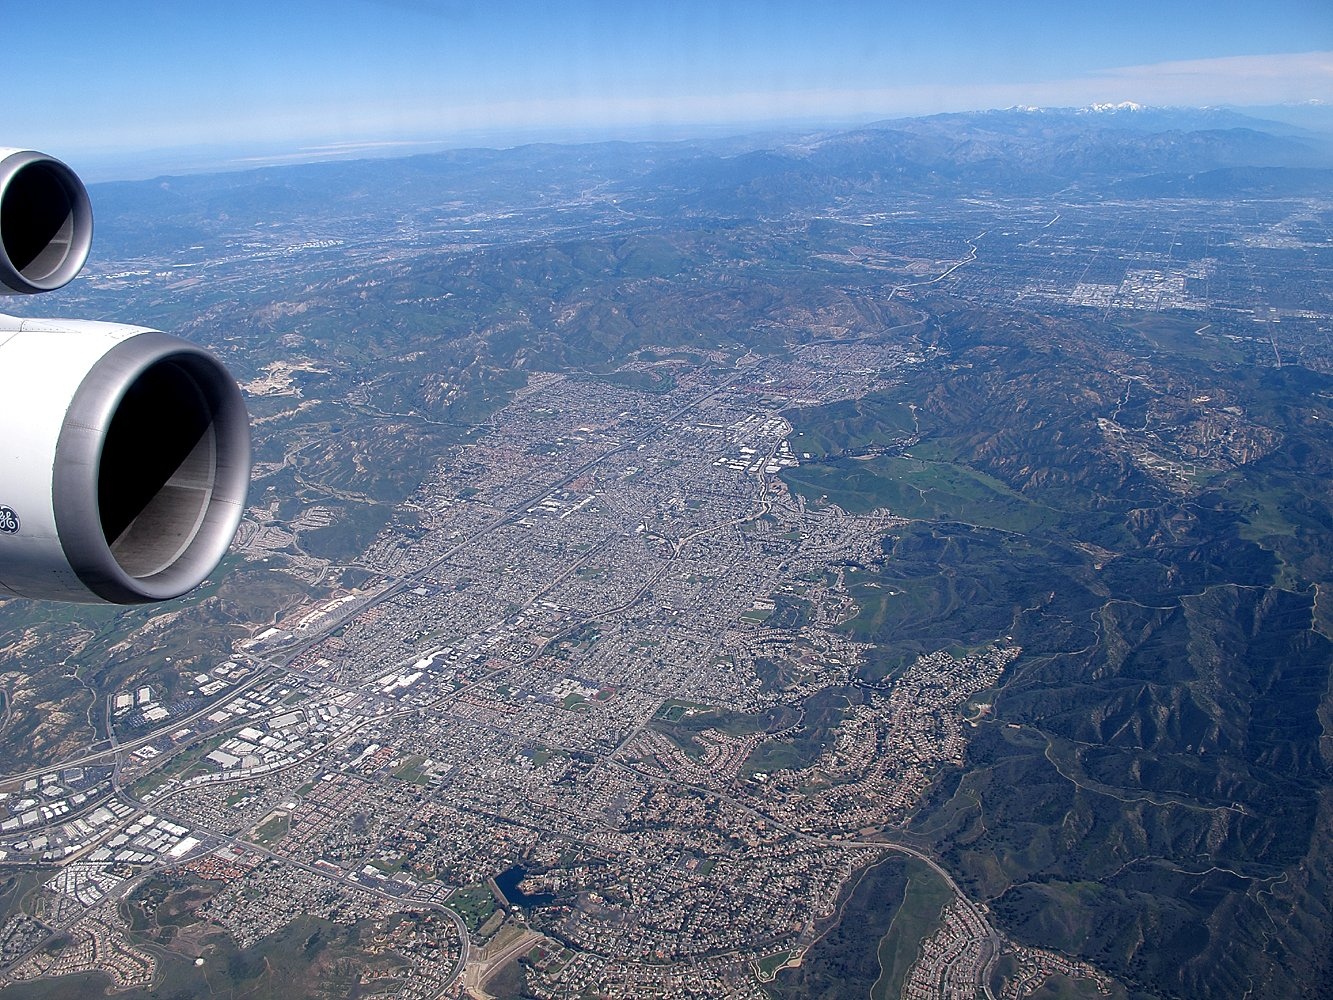 Anflug auf L.A.